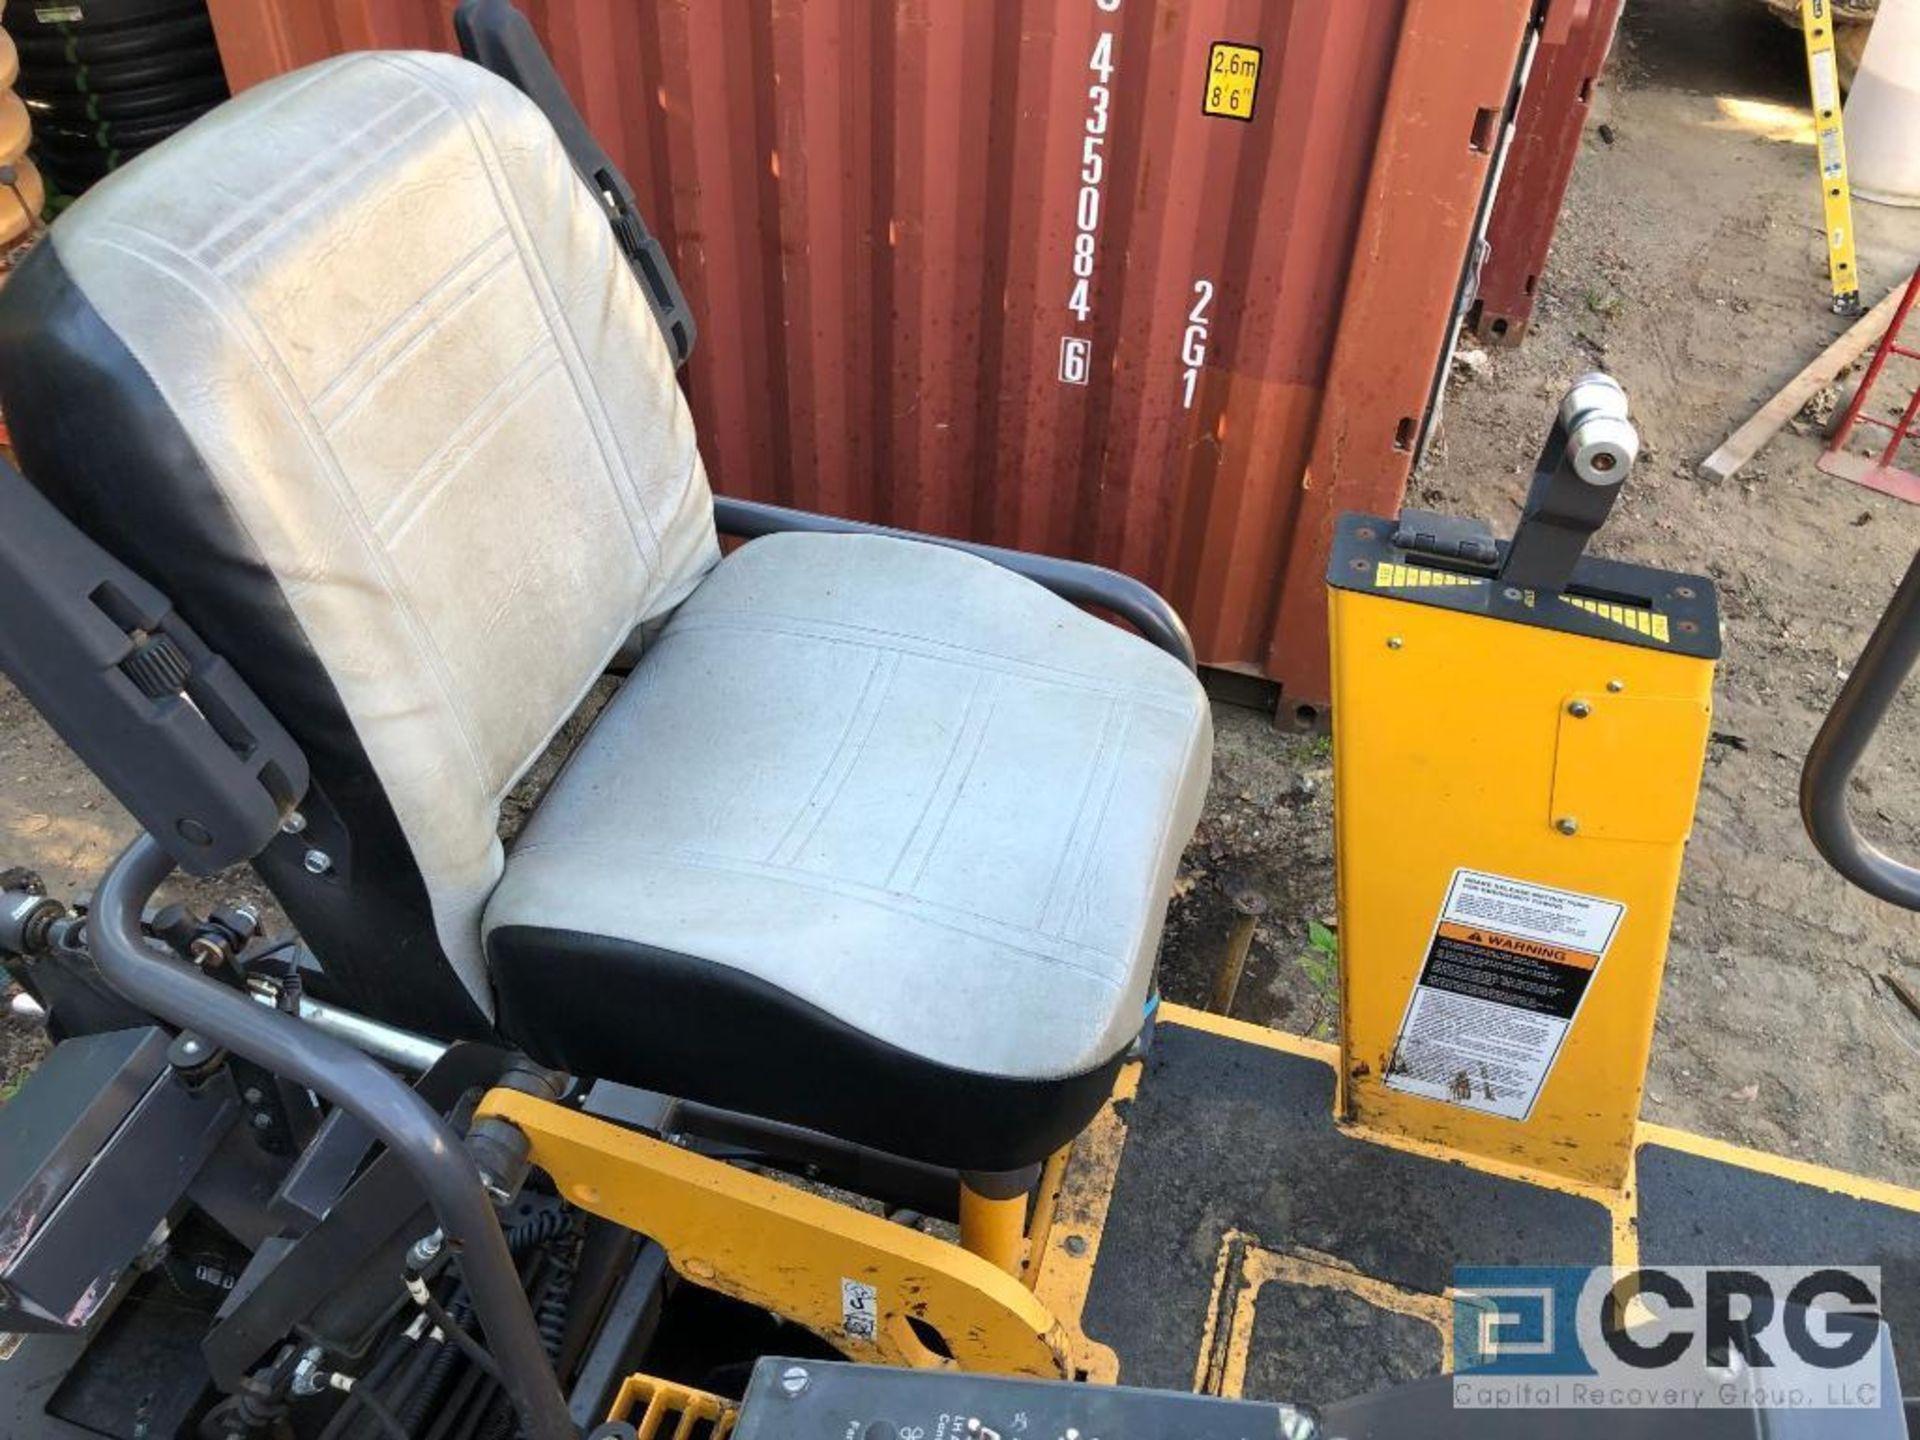 Lot 309 - 2018 Volvo P4410B Paver, Deutz TCD 4.1 L T4F 155 HP Engine, Independent, Hydrostatic Direct Drive